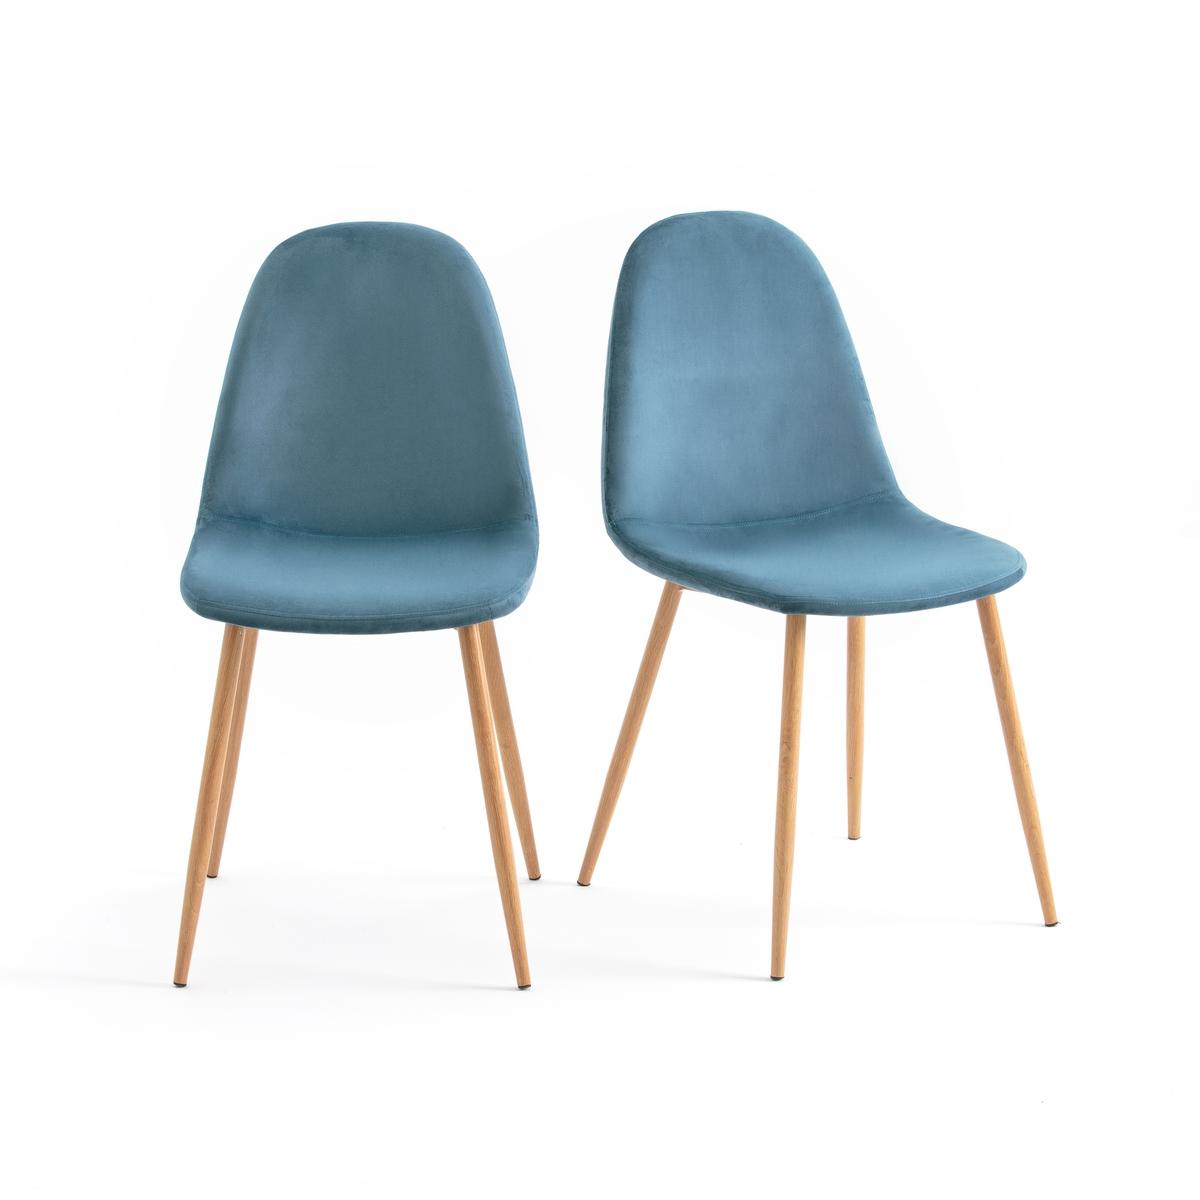 2 стула Lavergne